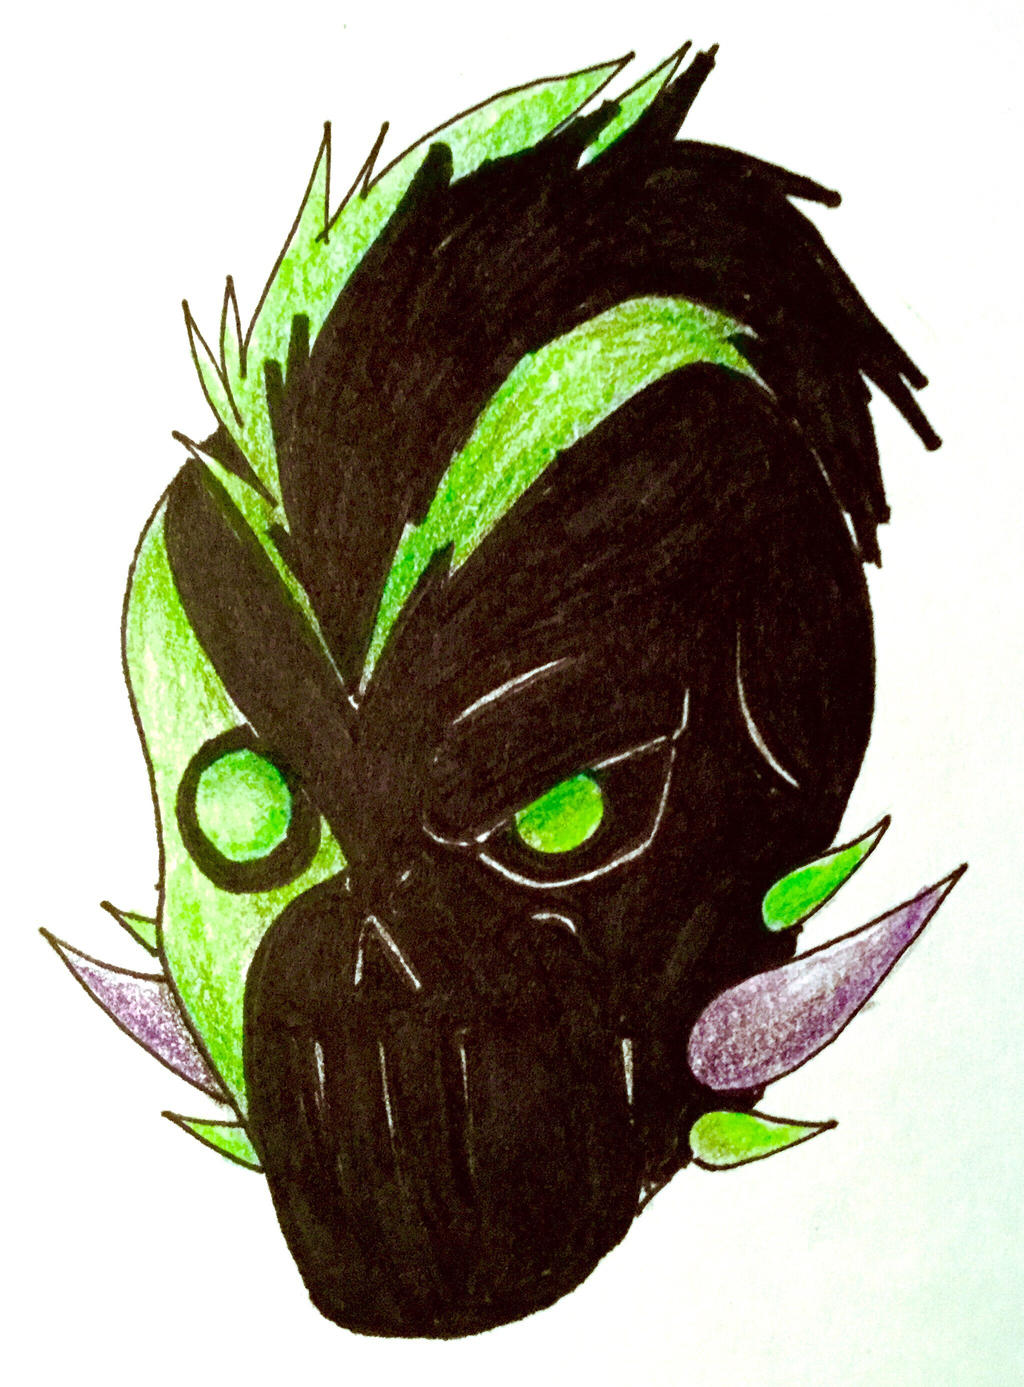 My Oc Villain Mask By Bethanygamemaster On Deviantart